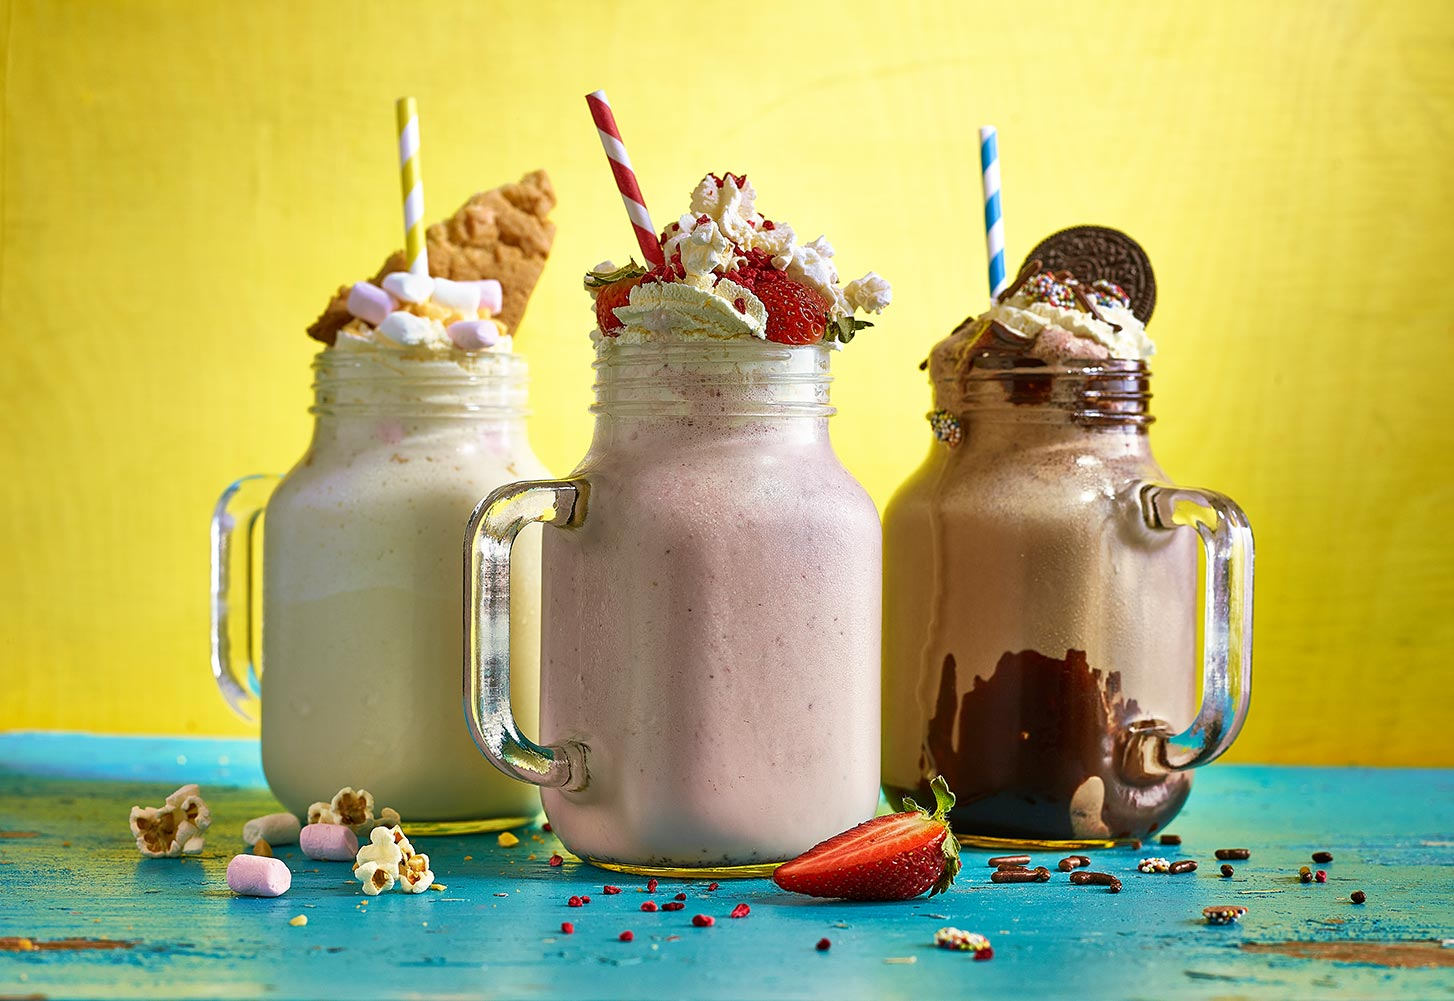 Shaken Not Stirred! Milkshakes in a Jar...